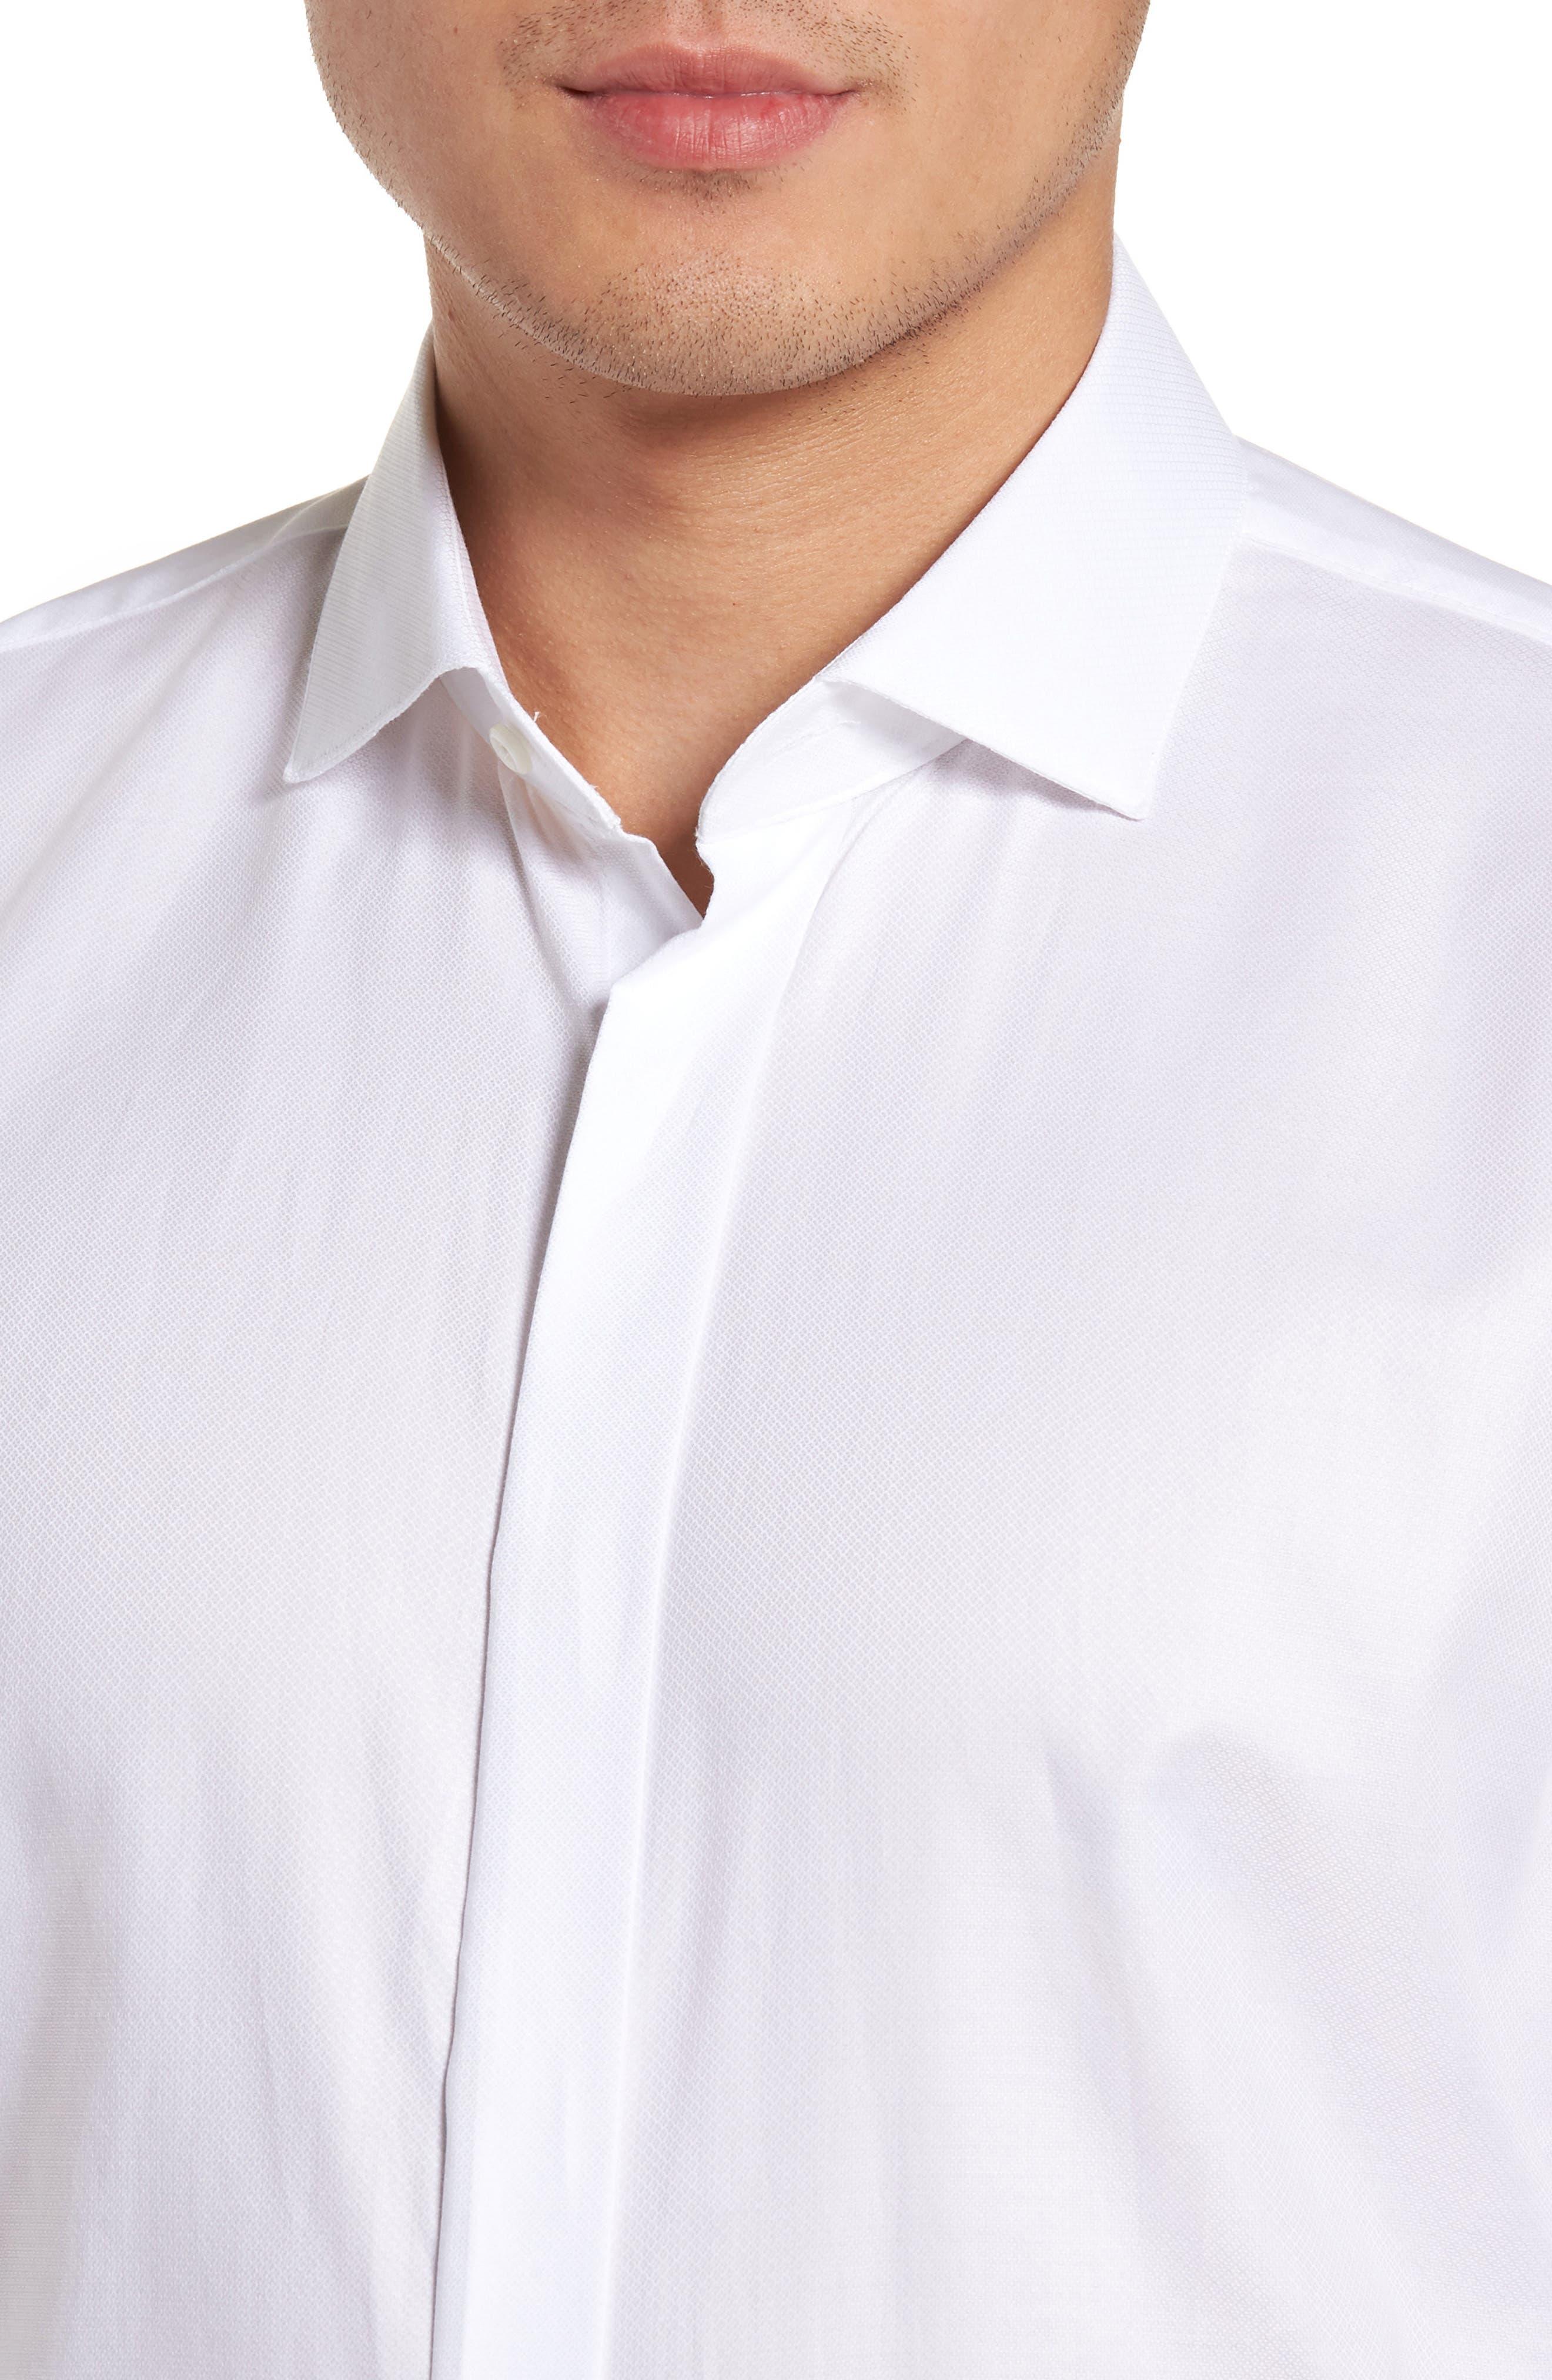 Trim Fit Tuxedo Shirt,                             Alternate thumbnail 2, color,                             100